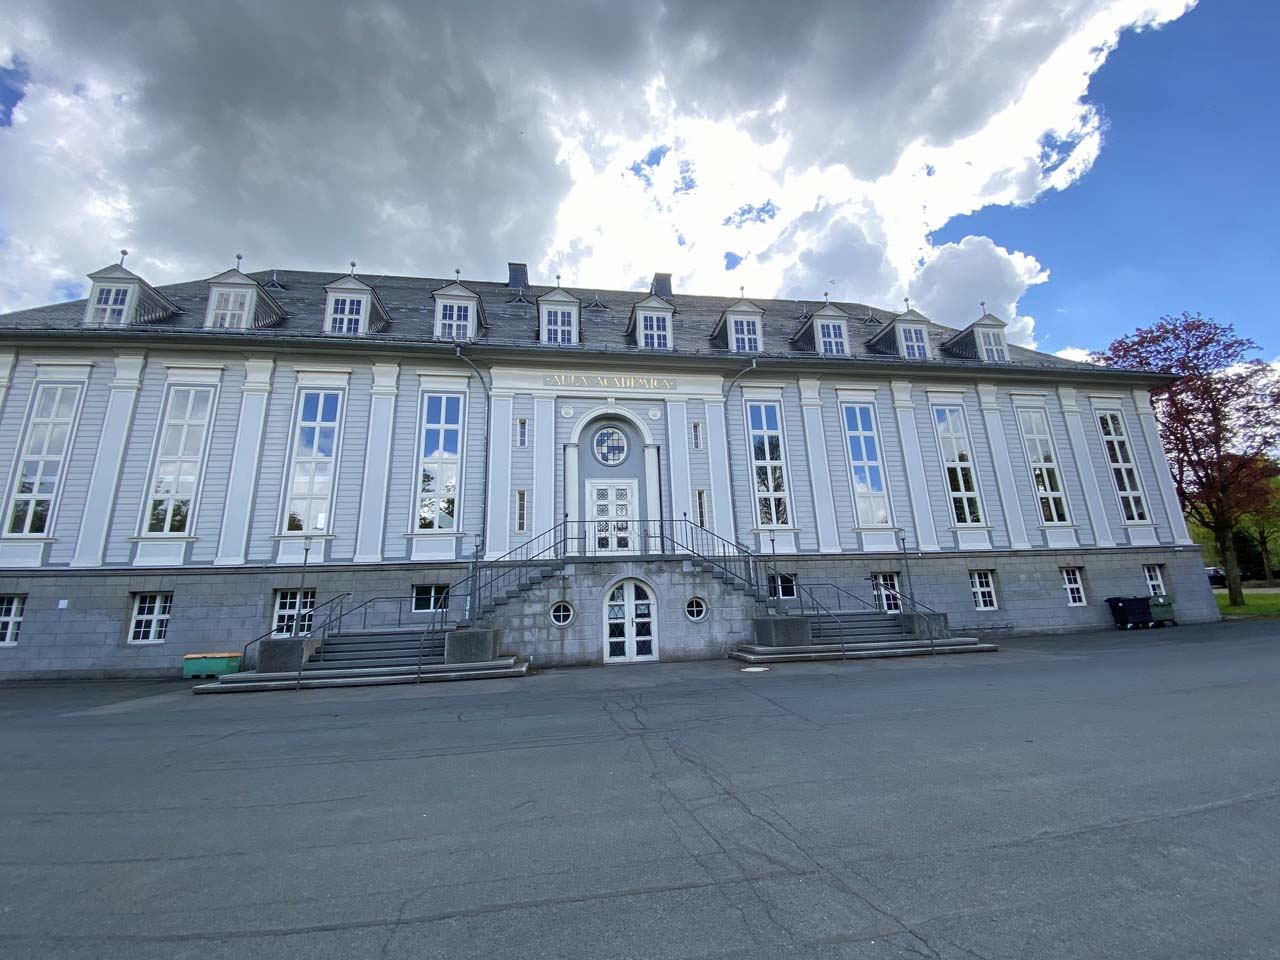 Aula Academica Vordereingang